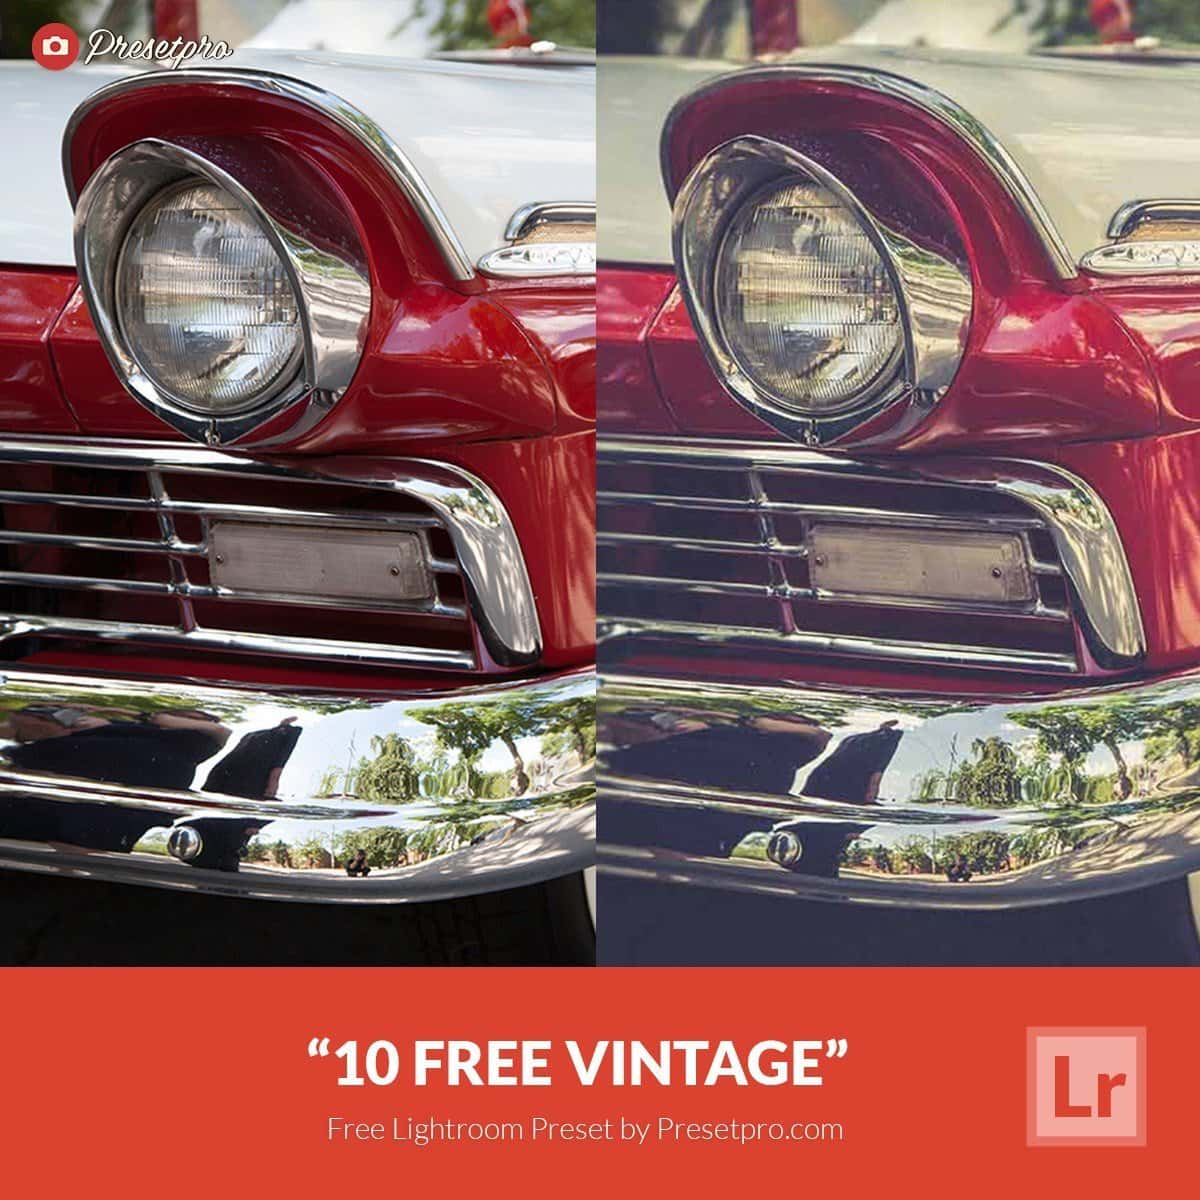 Free Lightroom Preset 10 Free Vintage Presets Presetpro.com